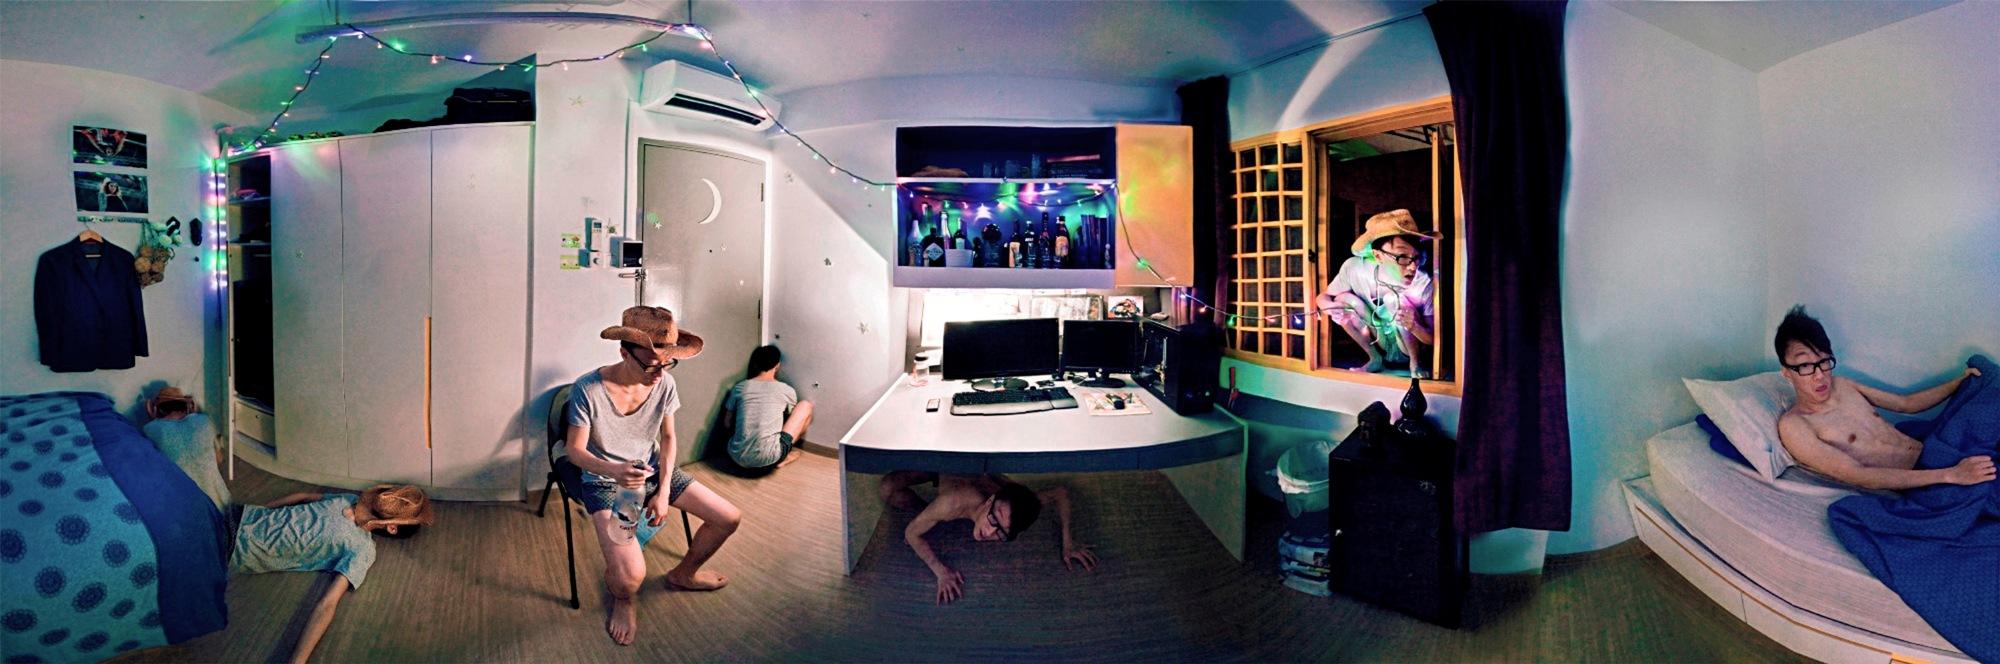 Panoramic - Room Series